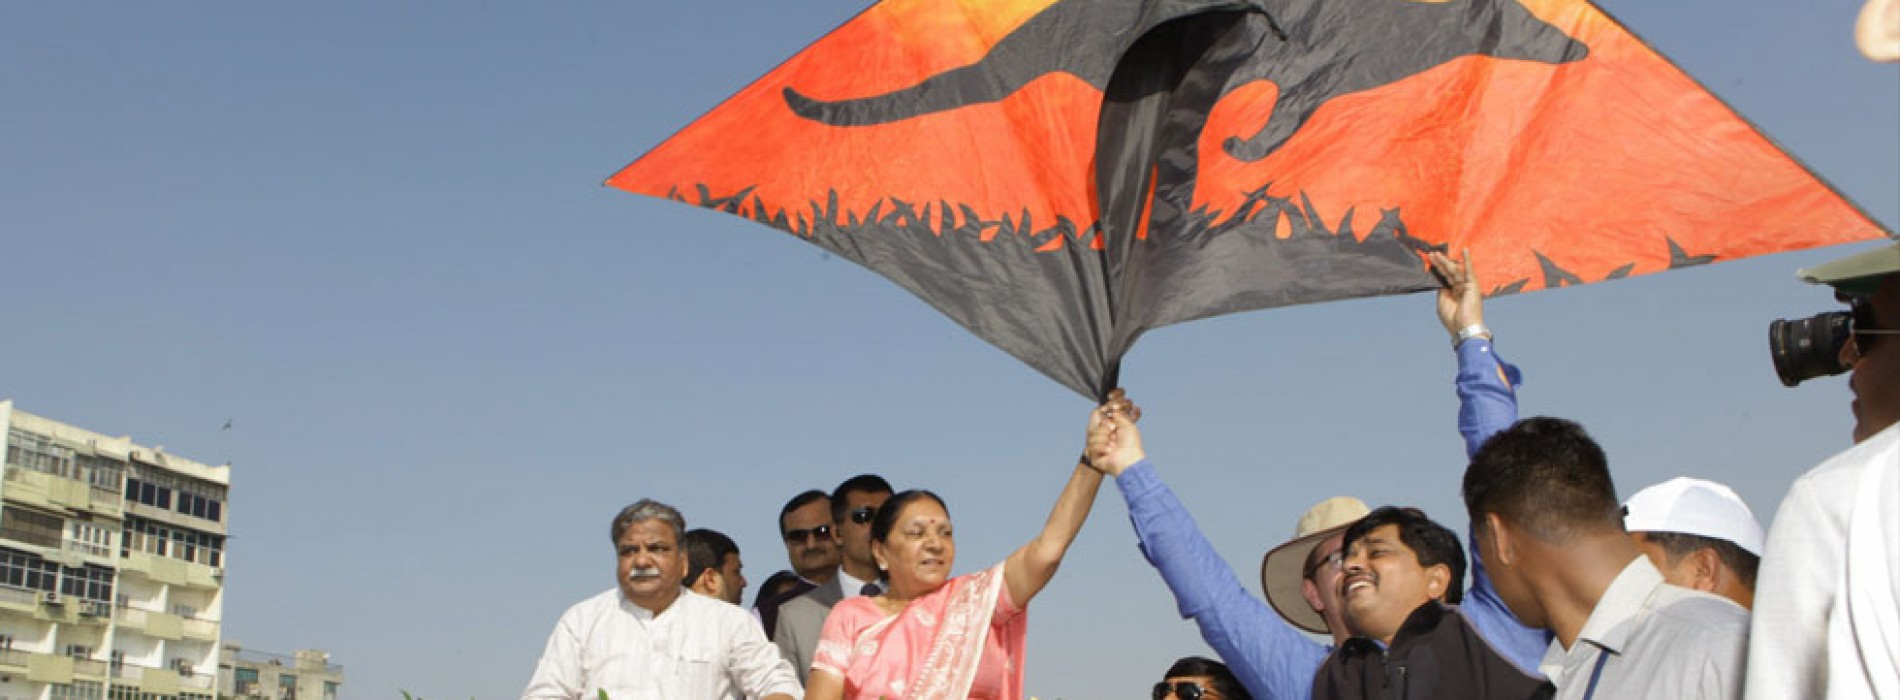 Gujarat's Kite Festival '16: grand and colorful